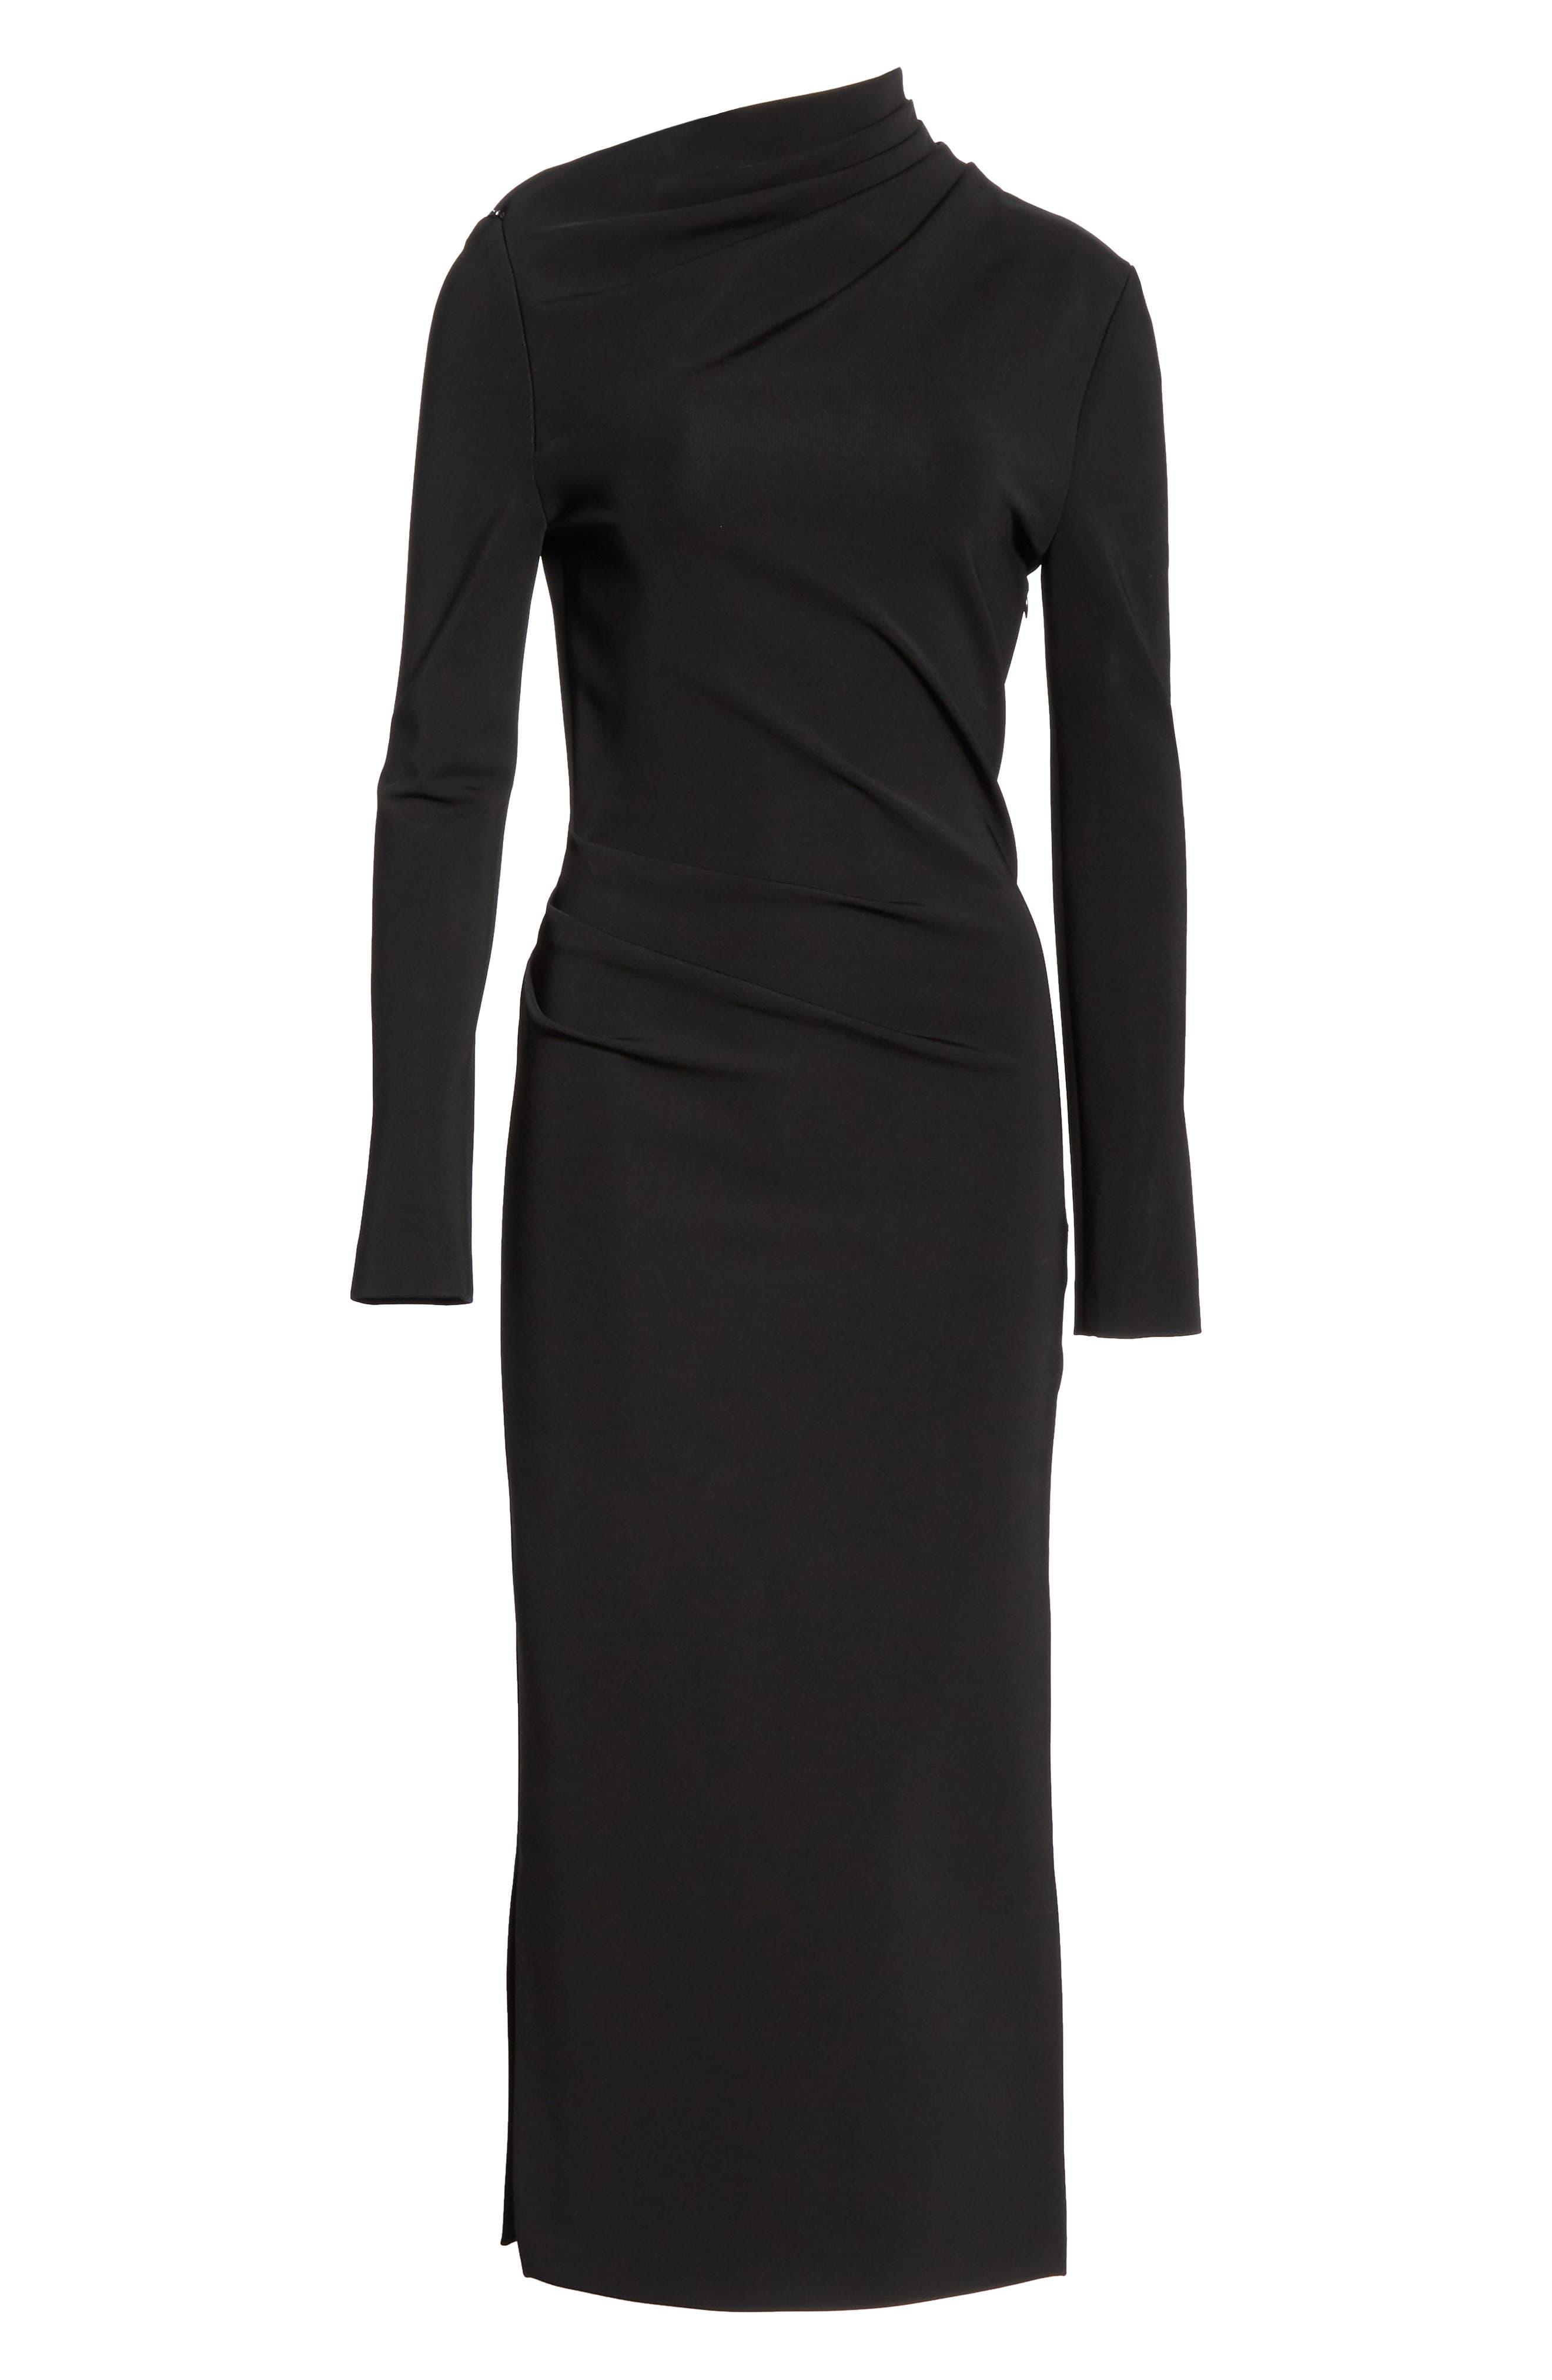 BRANDON MAXWELL, Side Drape Jersey Dress, Alternate thumbnail 7, color, BLACK